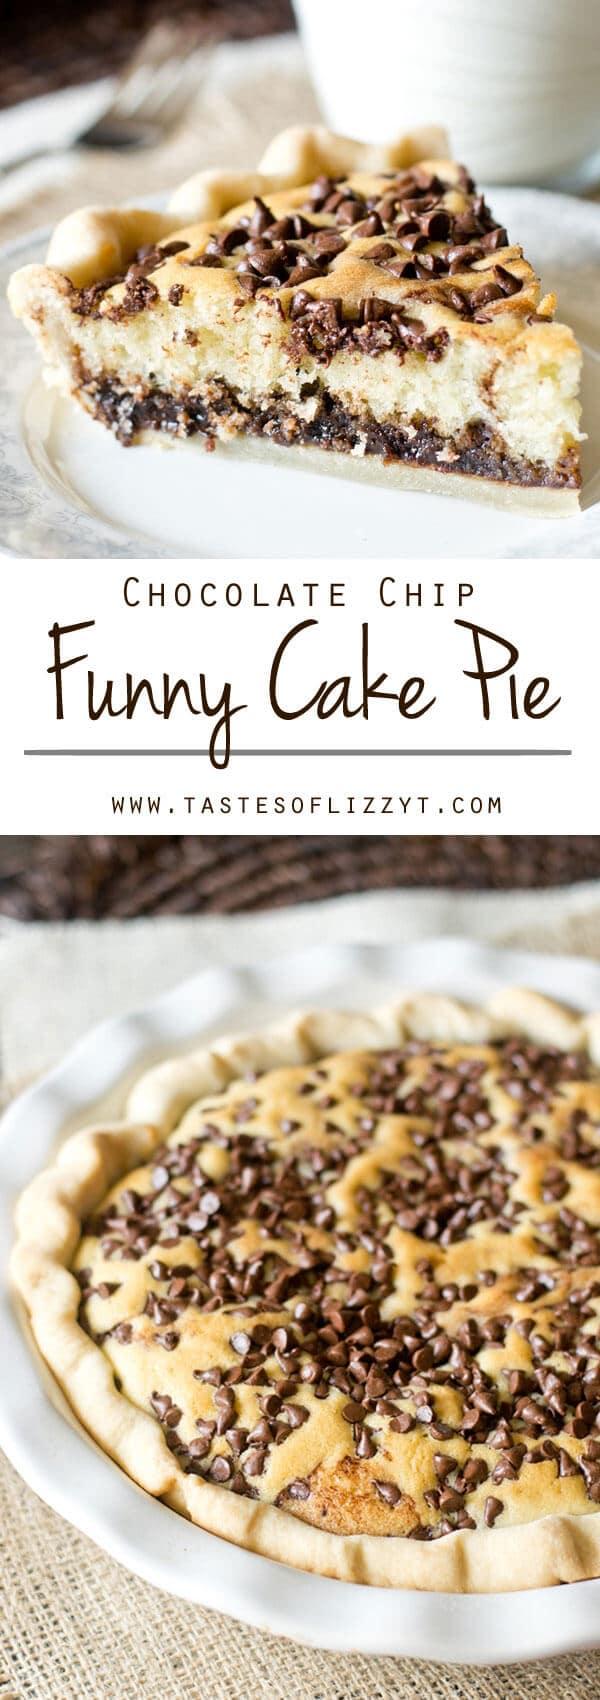 Can I Bake Chocolate Chips Inside A Cake